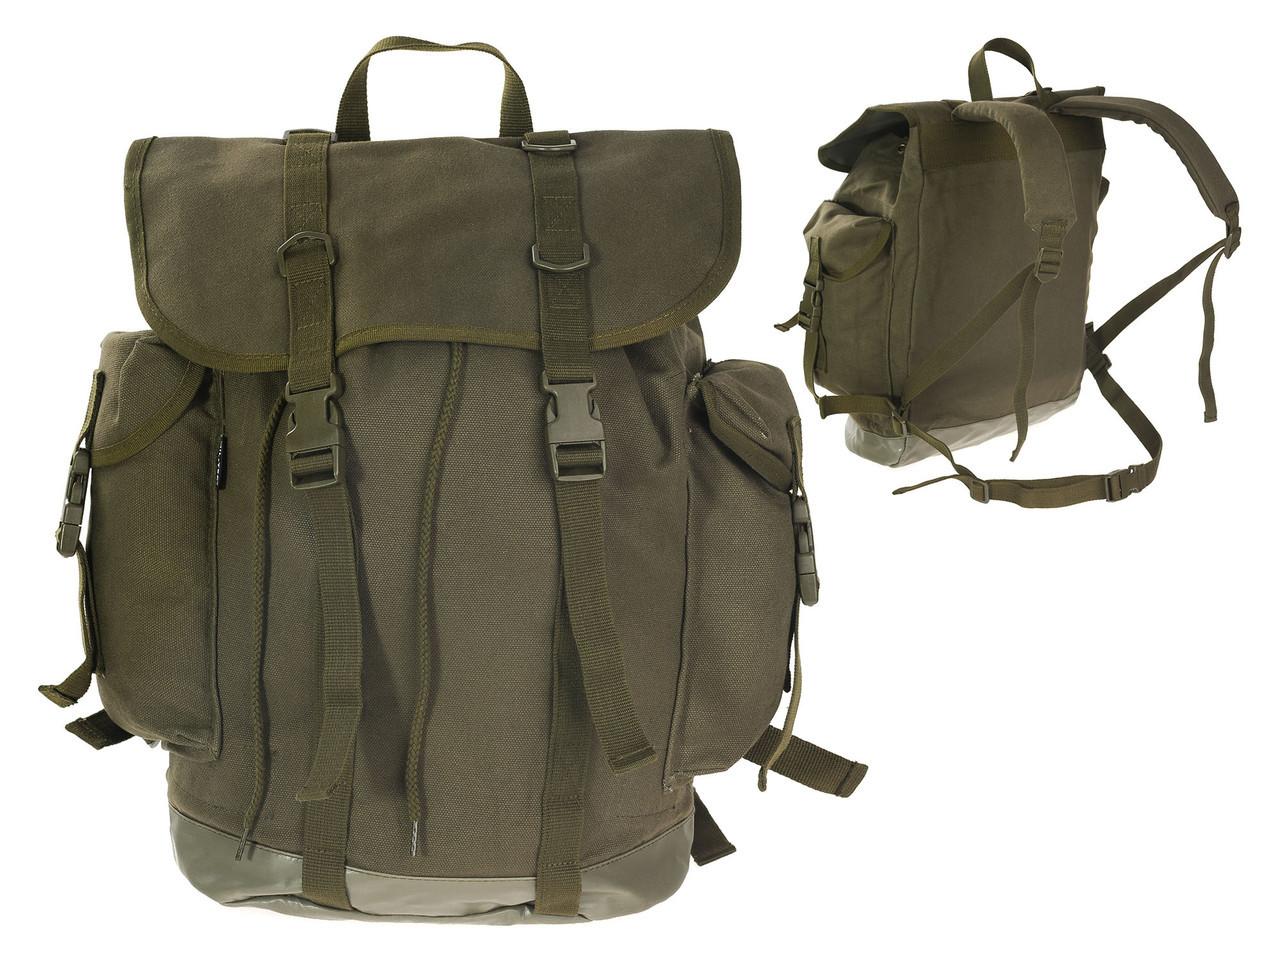 Рюкзак бундесвера recon отзывы термо рюкзак в dont starve